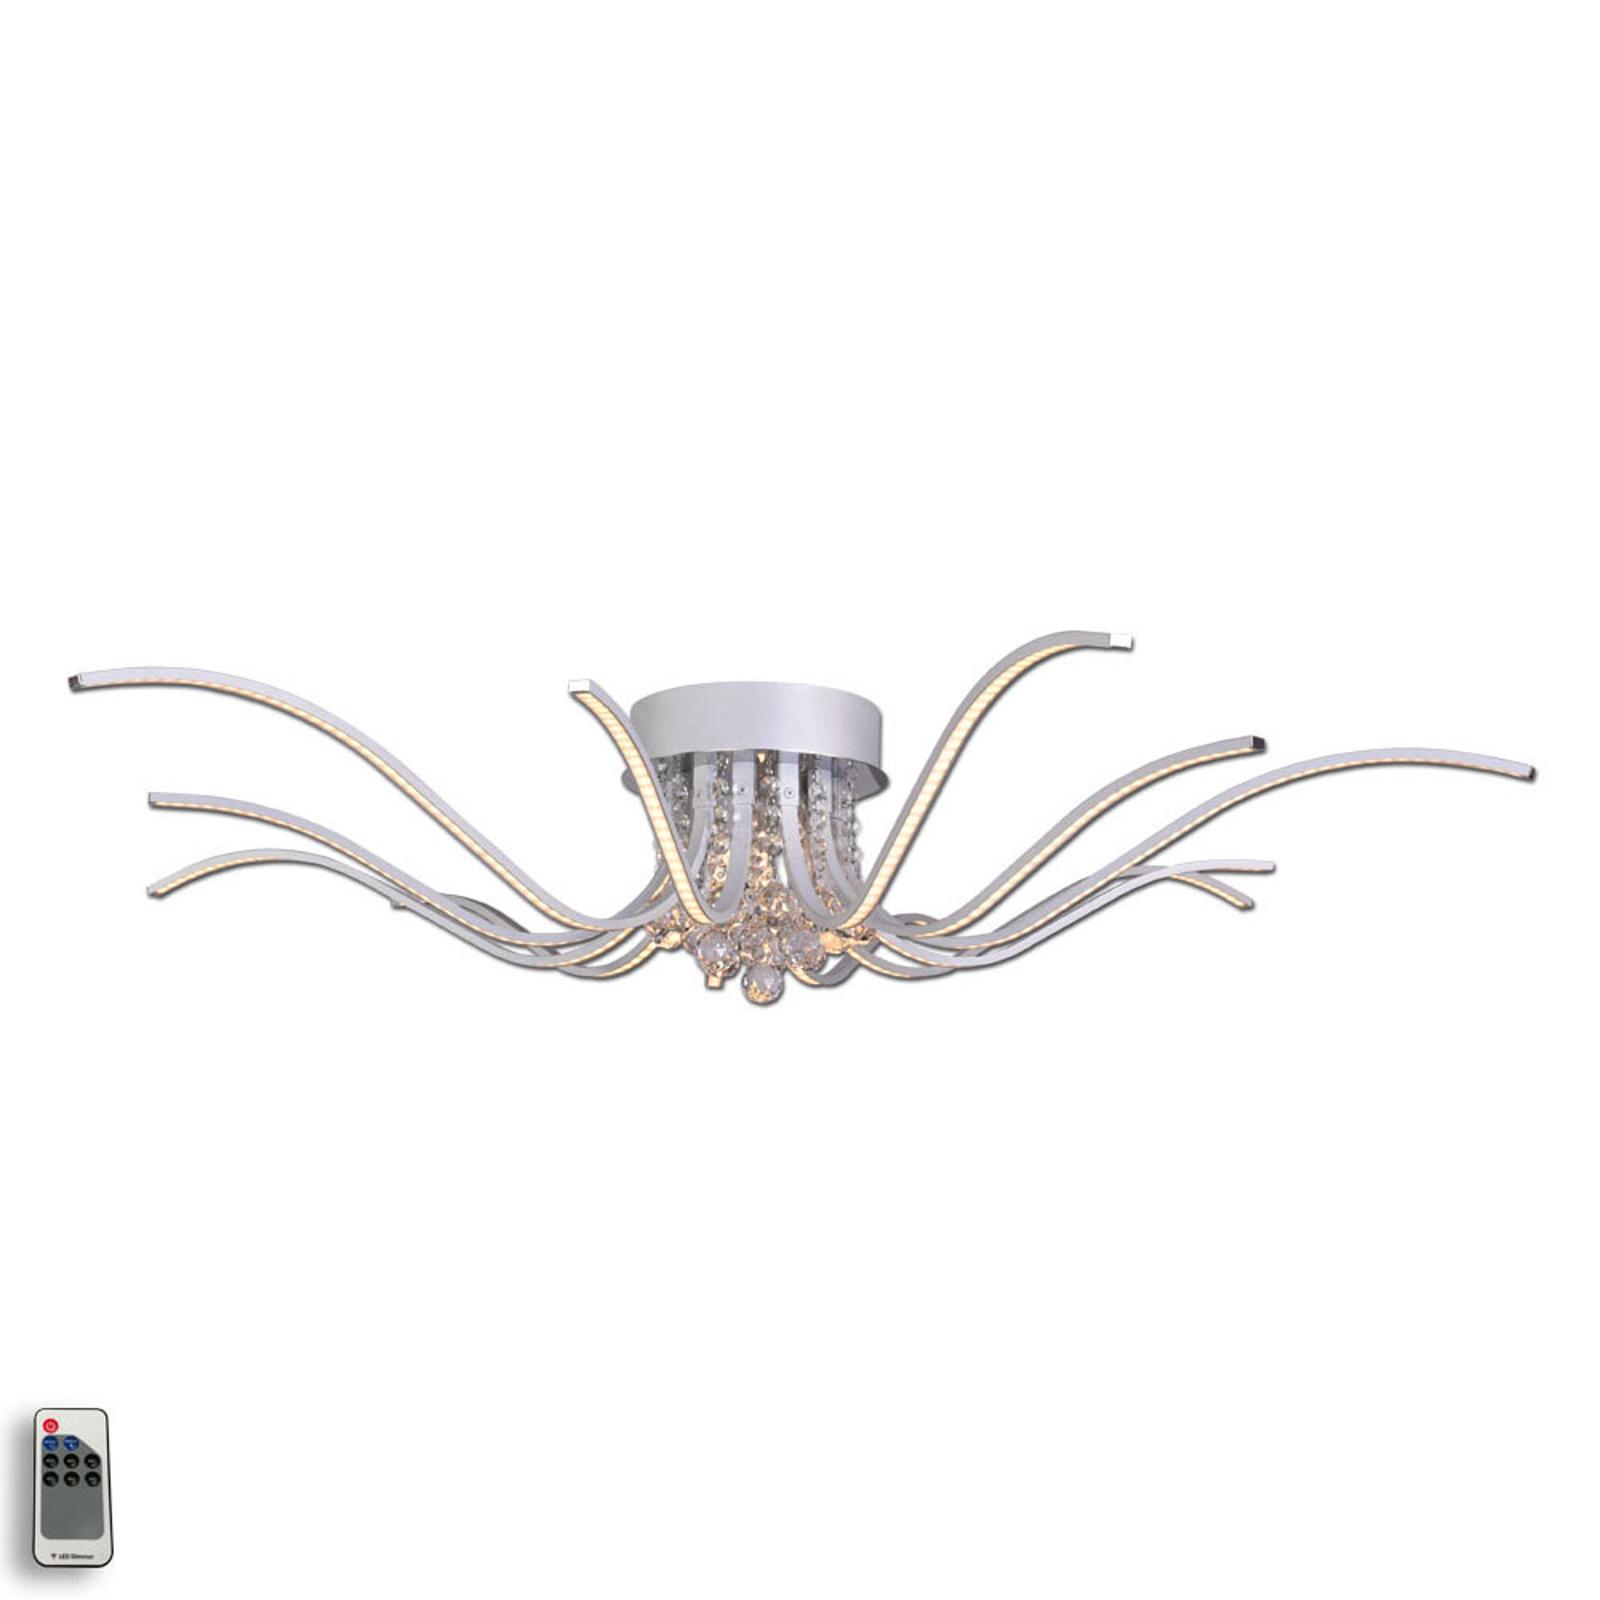 Lampa sufitowa LED Lumenos z kryształami aluminium